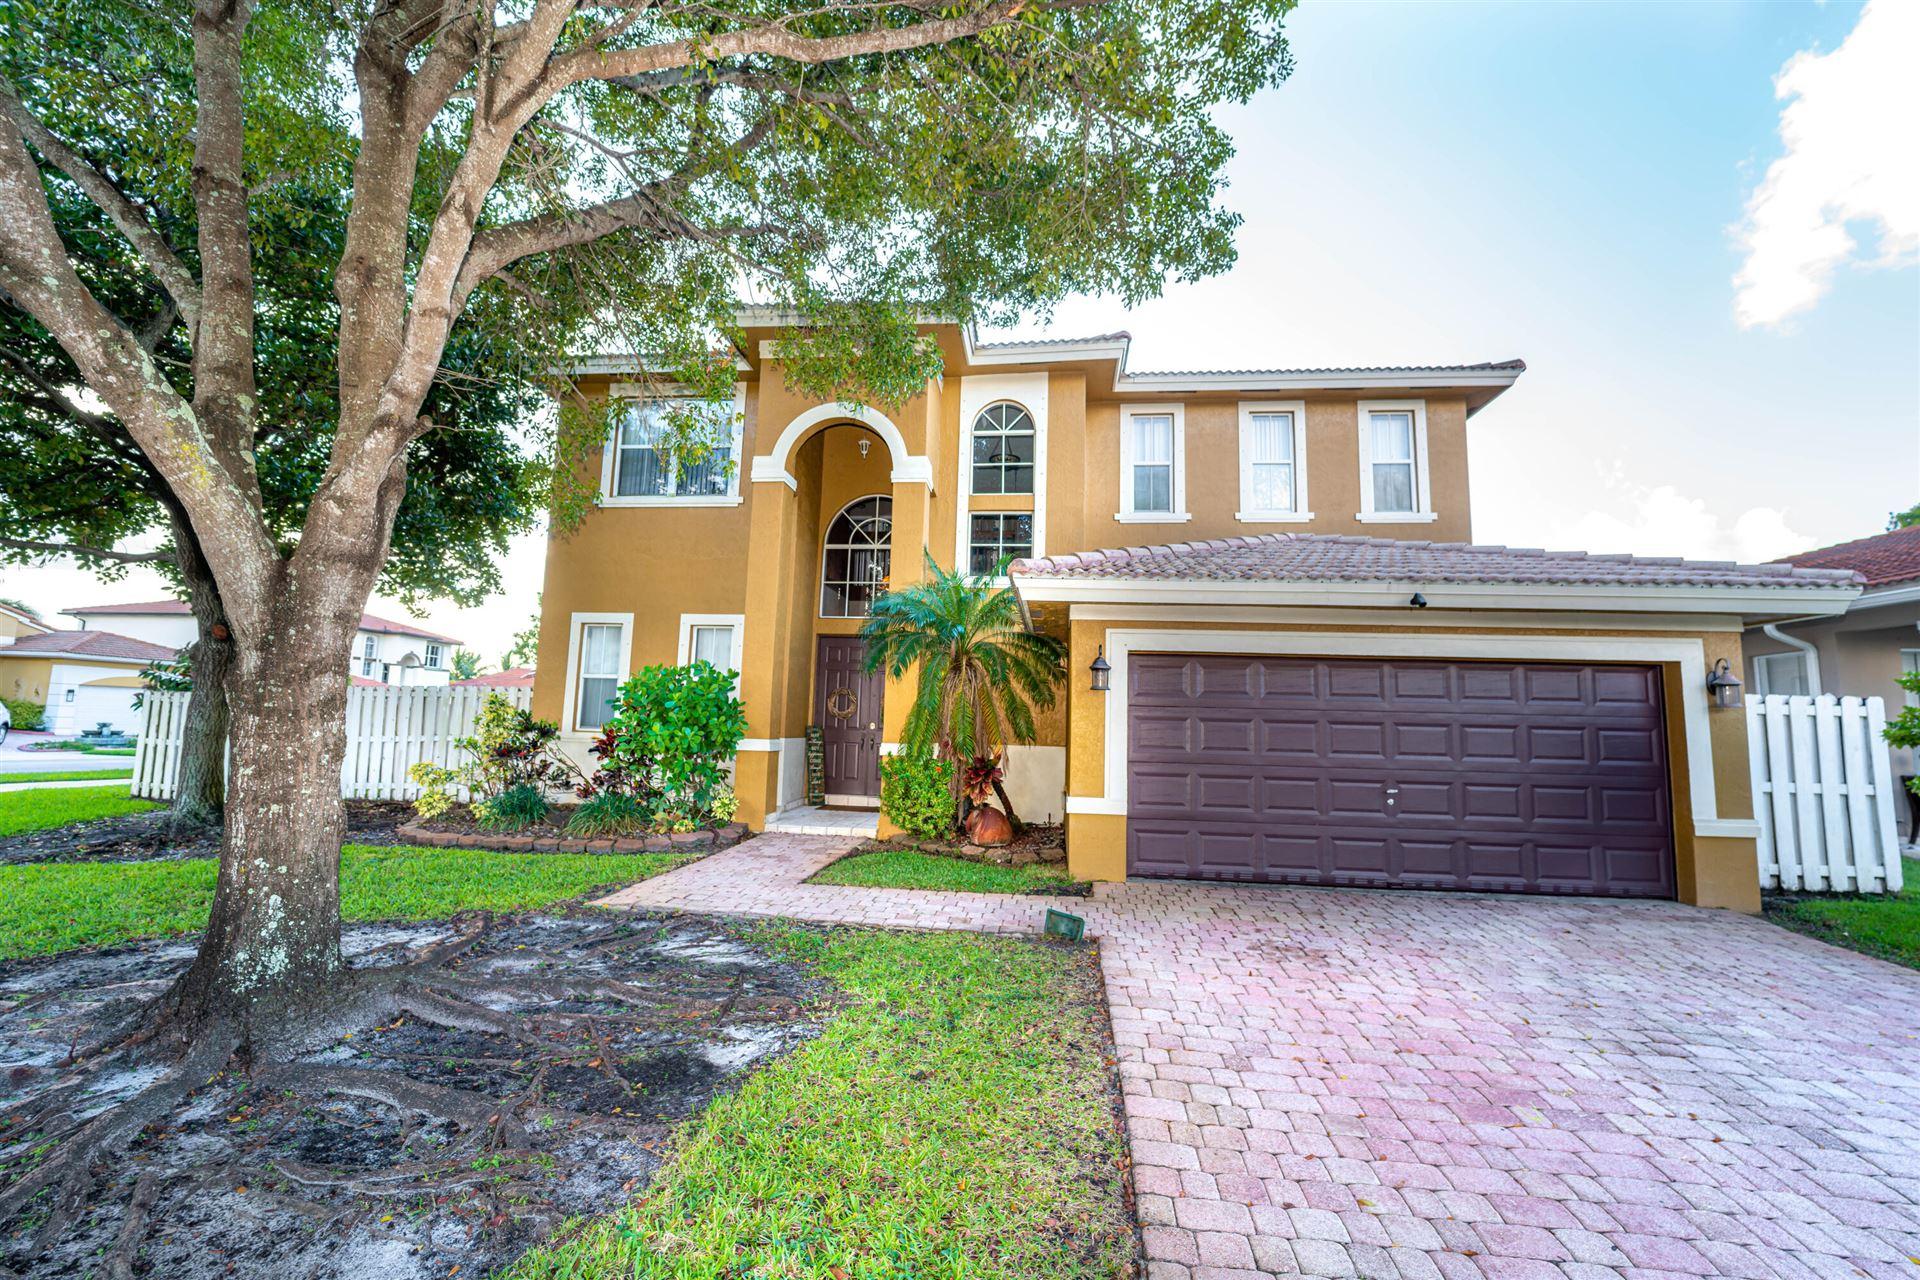 Photo of 2770 SW 138th Avenue, Miramar, FL 33027 (MLS # RX-10753788)